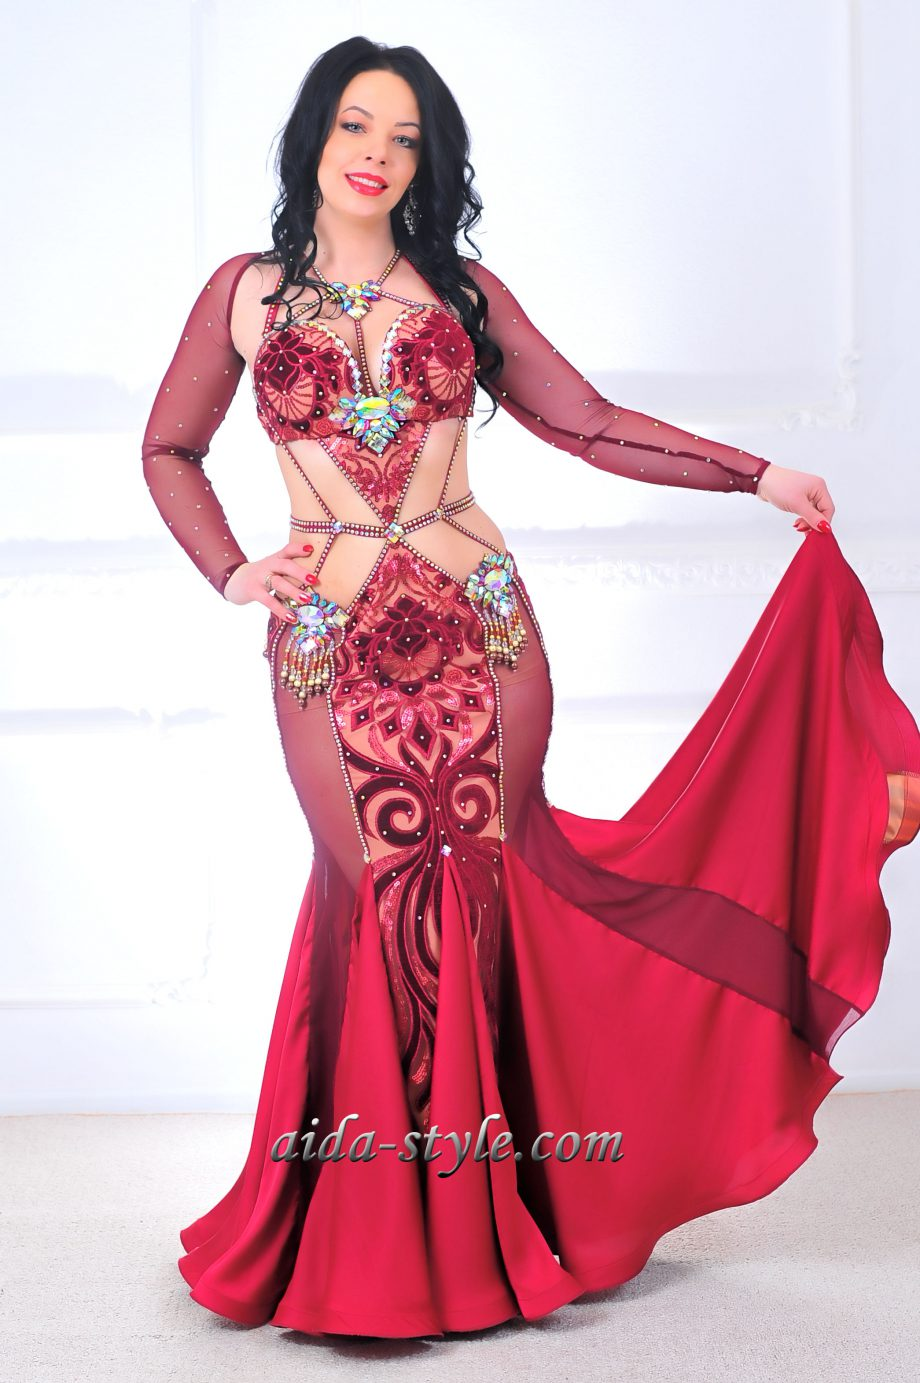 belly dancers dress